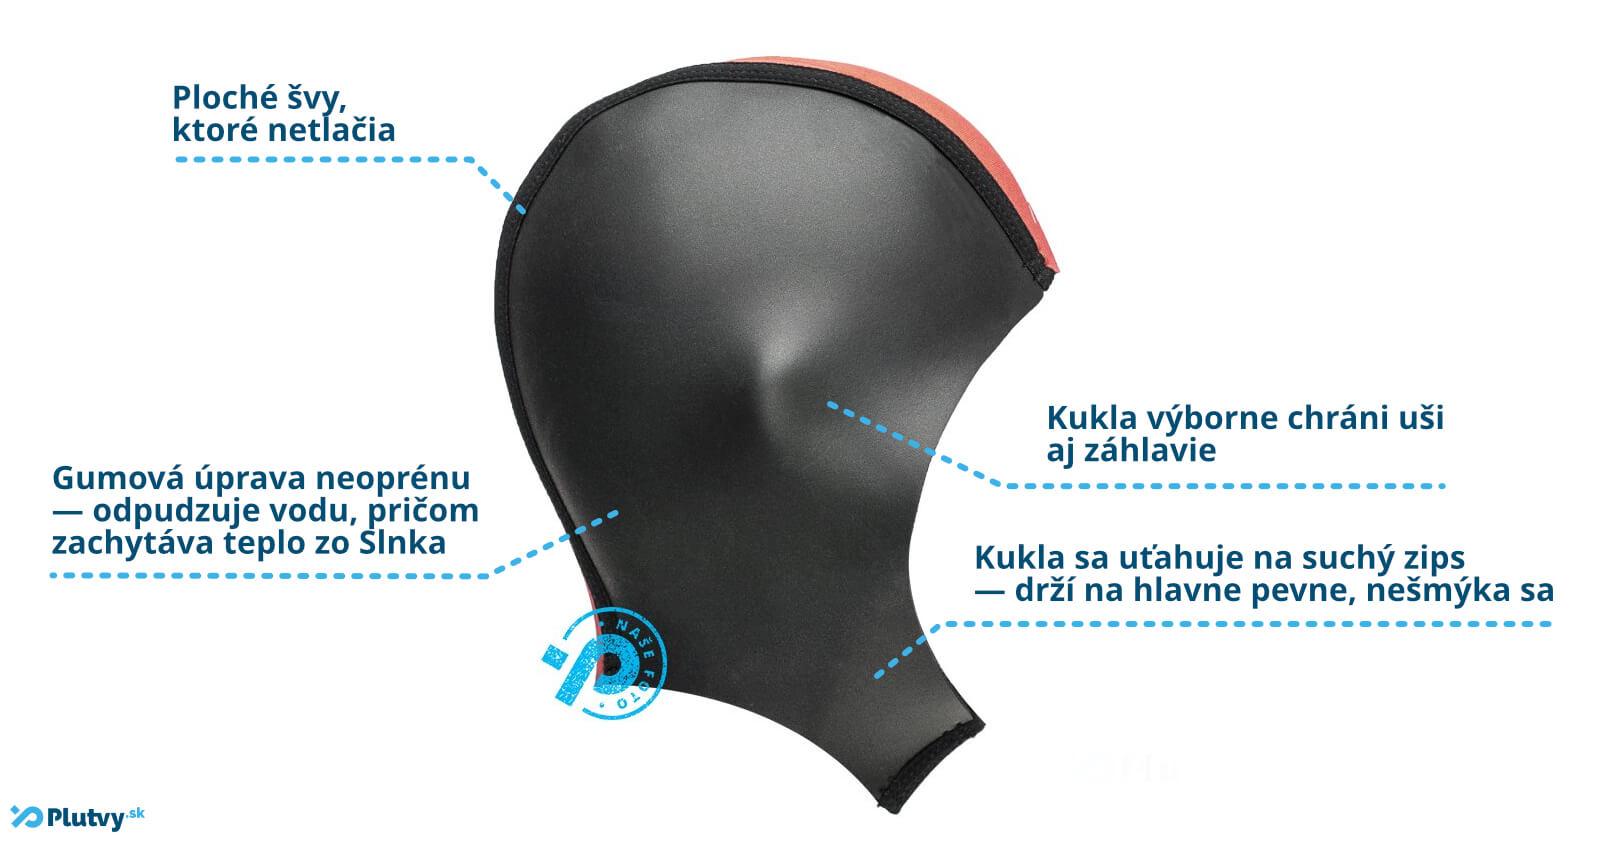 Triatlonová kukla Agama Eddy vyrobená z 3 mm hrubého neoprénu, Plutvy.sk Bratislava